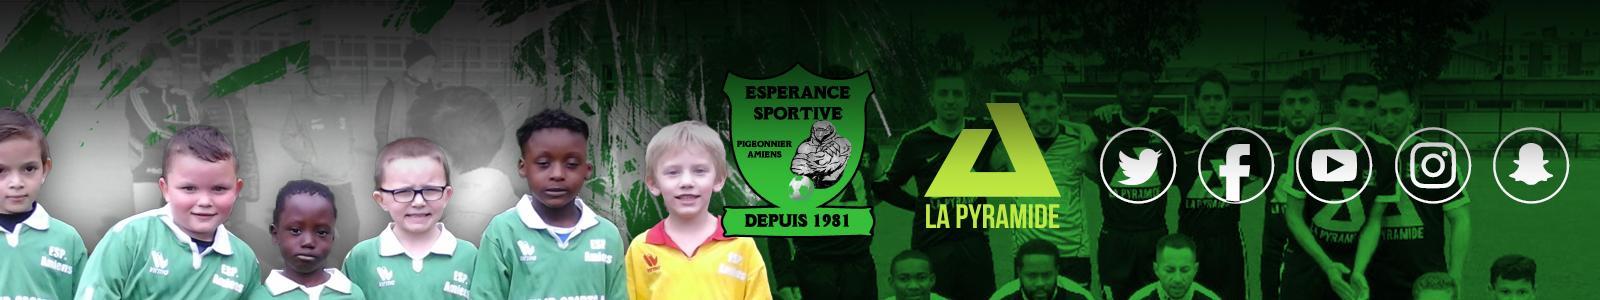 Espérance Sportive Pigeonnier Amiens : site officiel du club de foot de Amiens - footeo